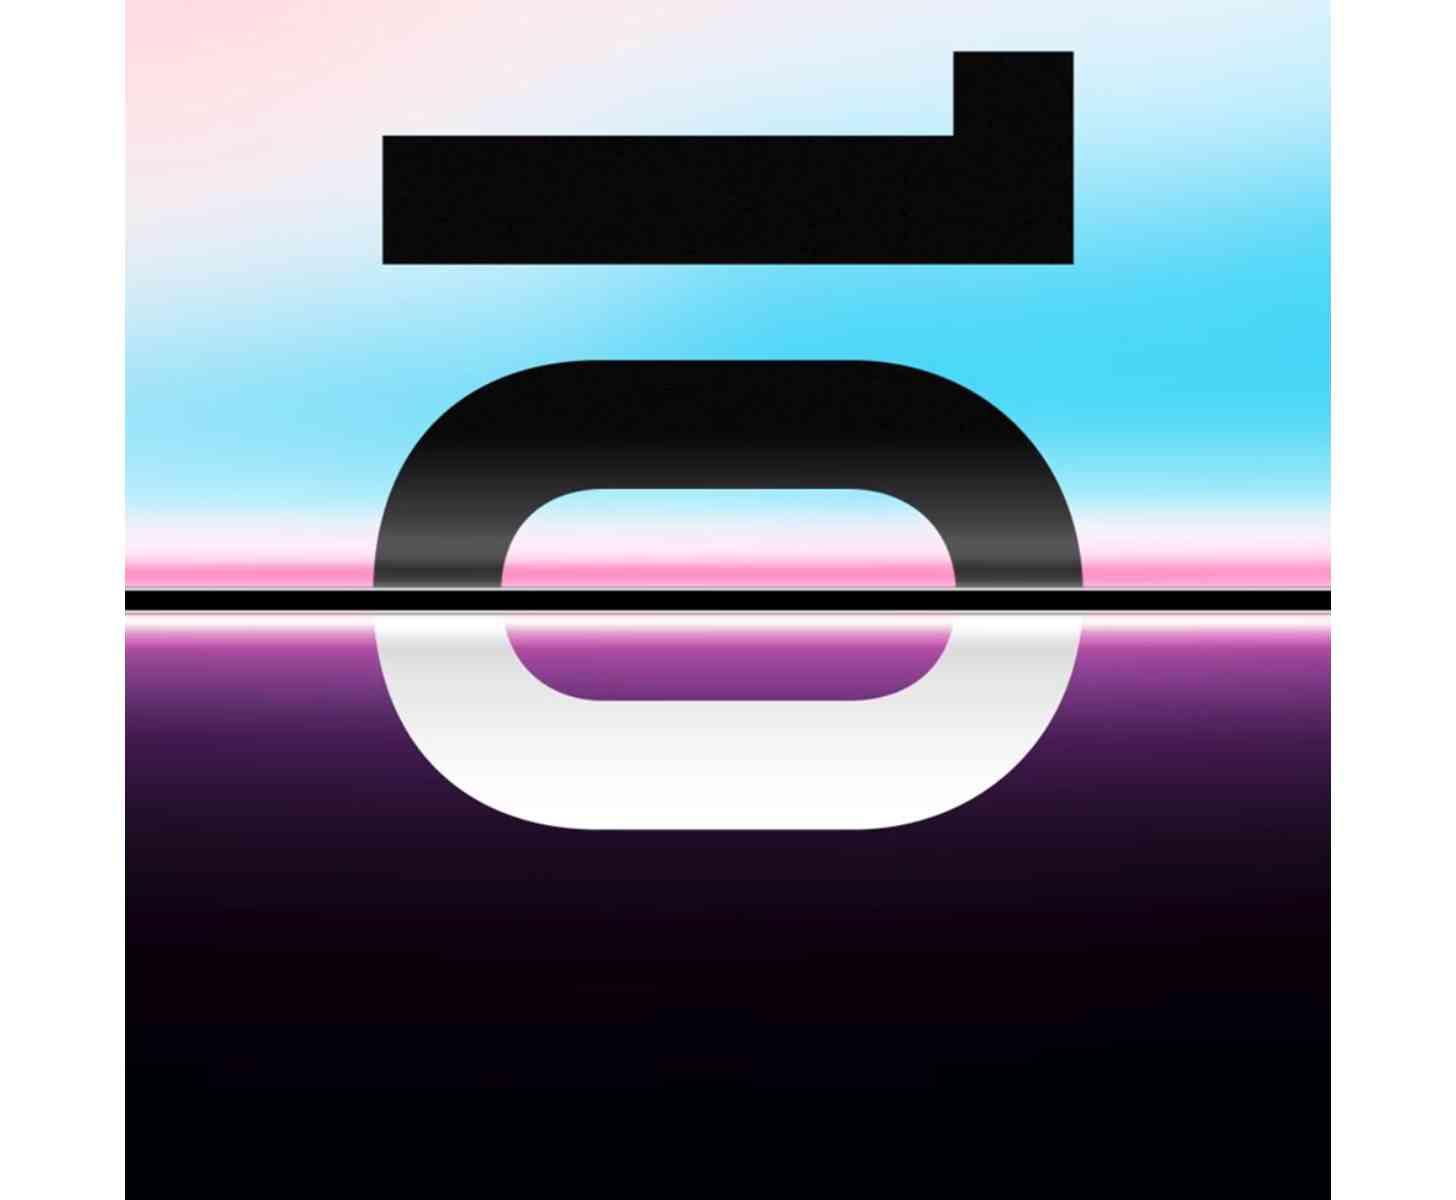 Samsung Galaxy S10 event teaser